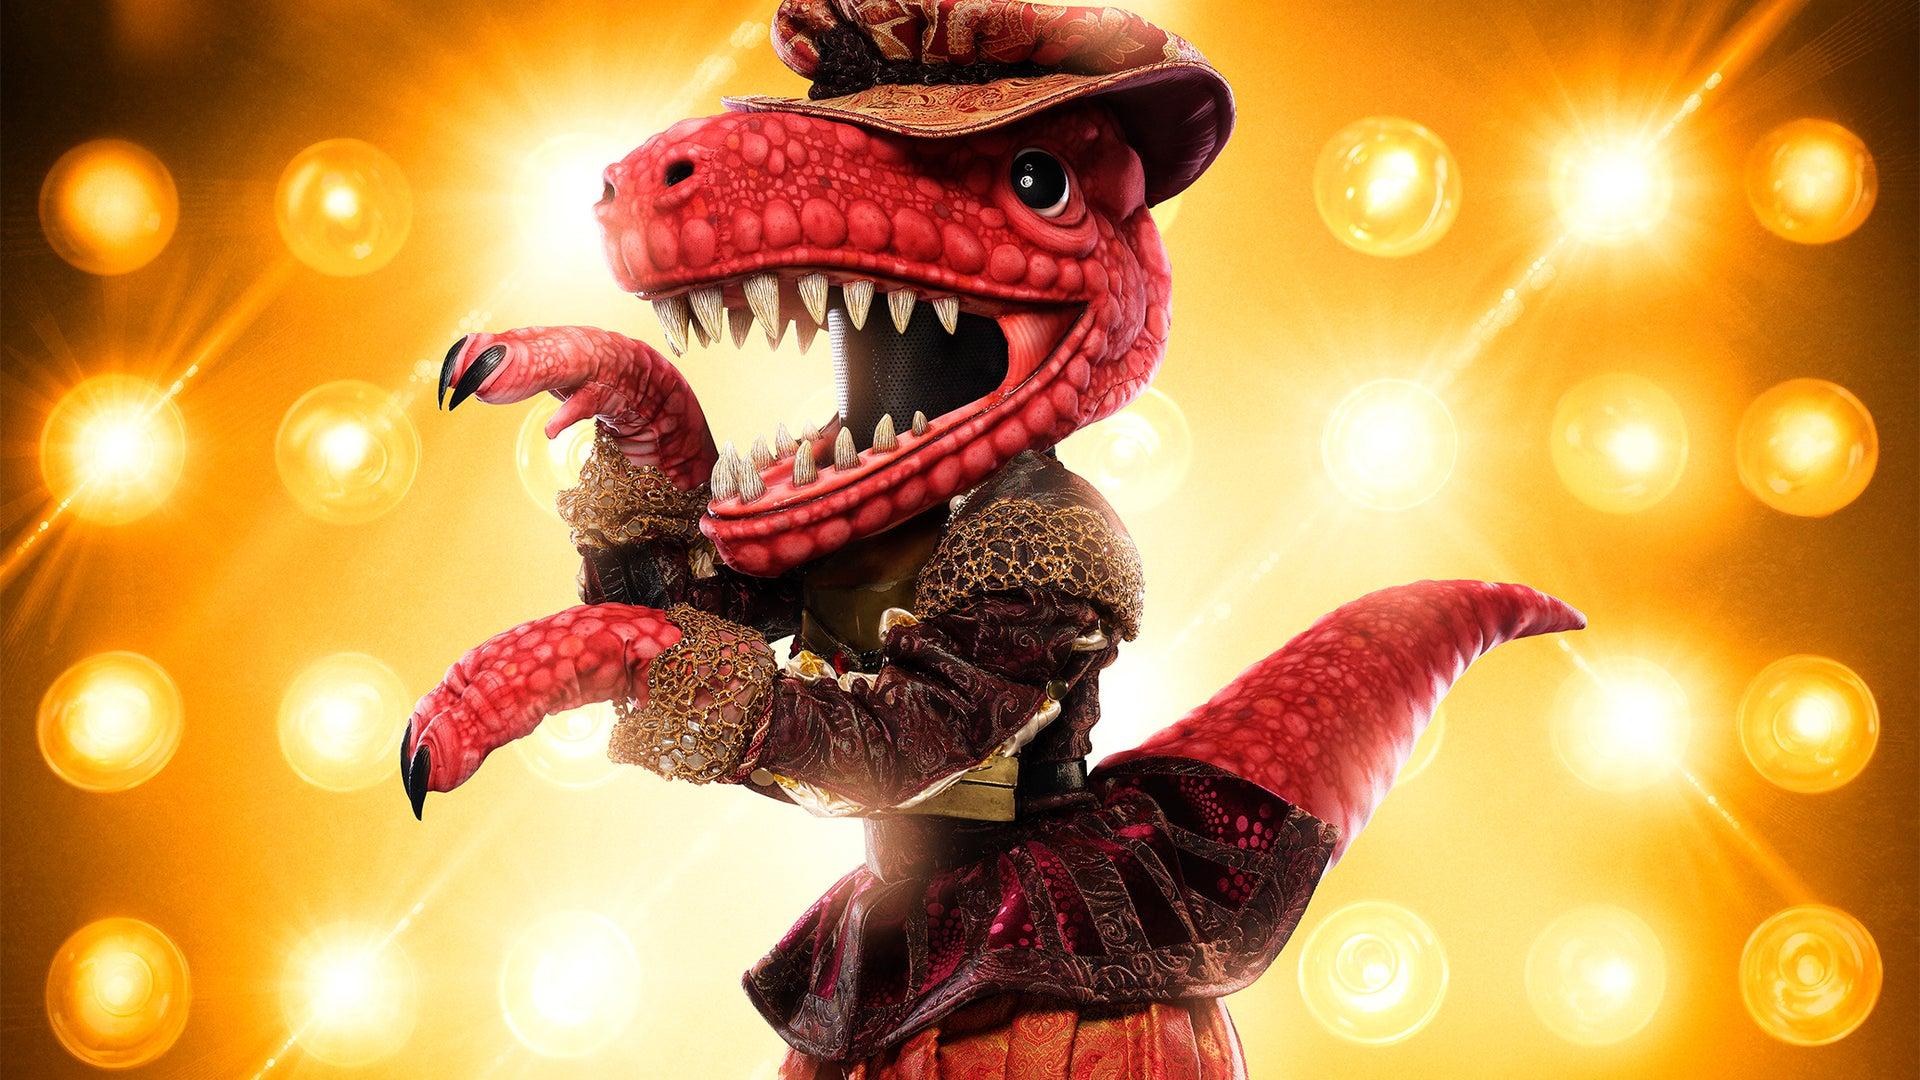 031220-masked-singer-t-rex.jpg